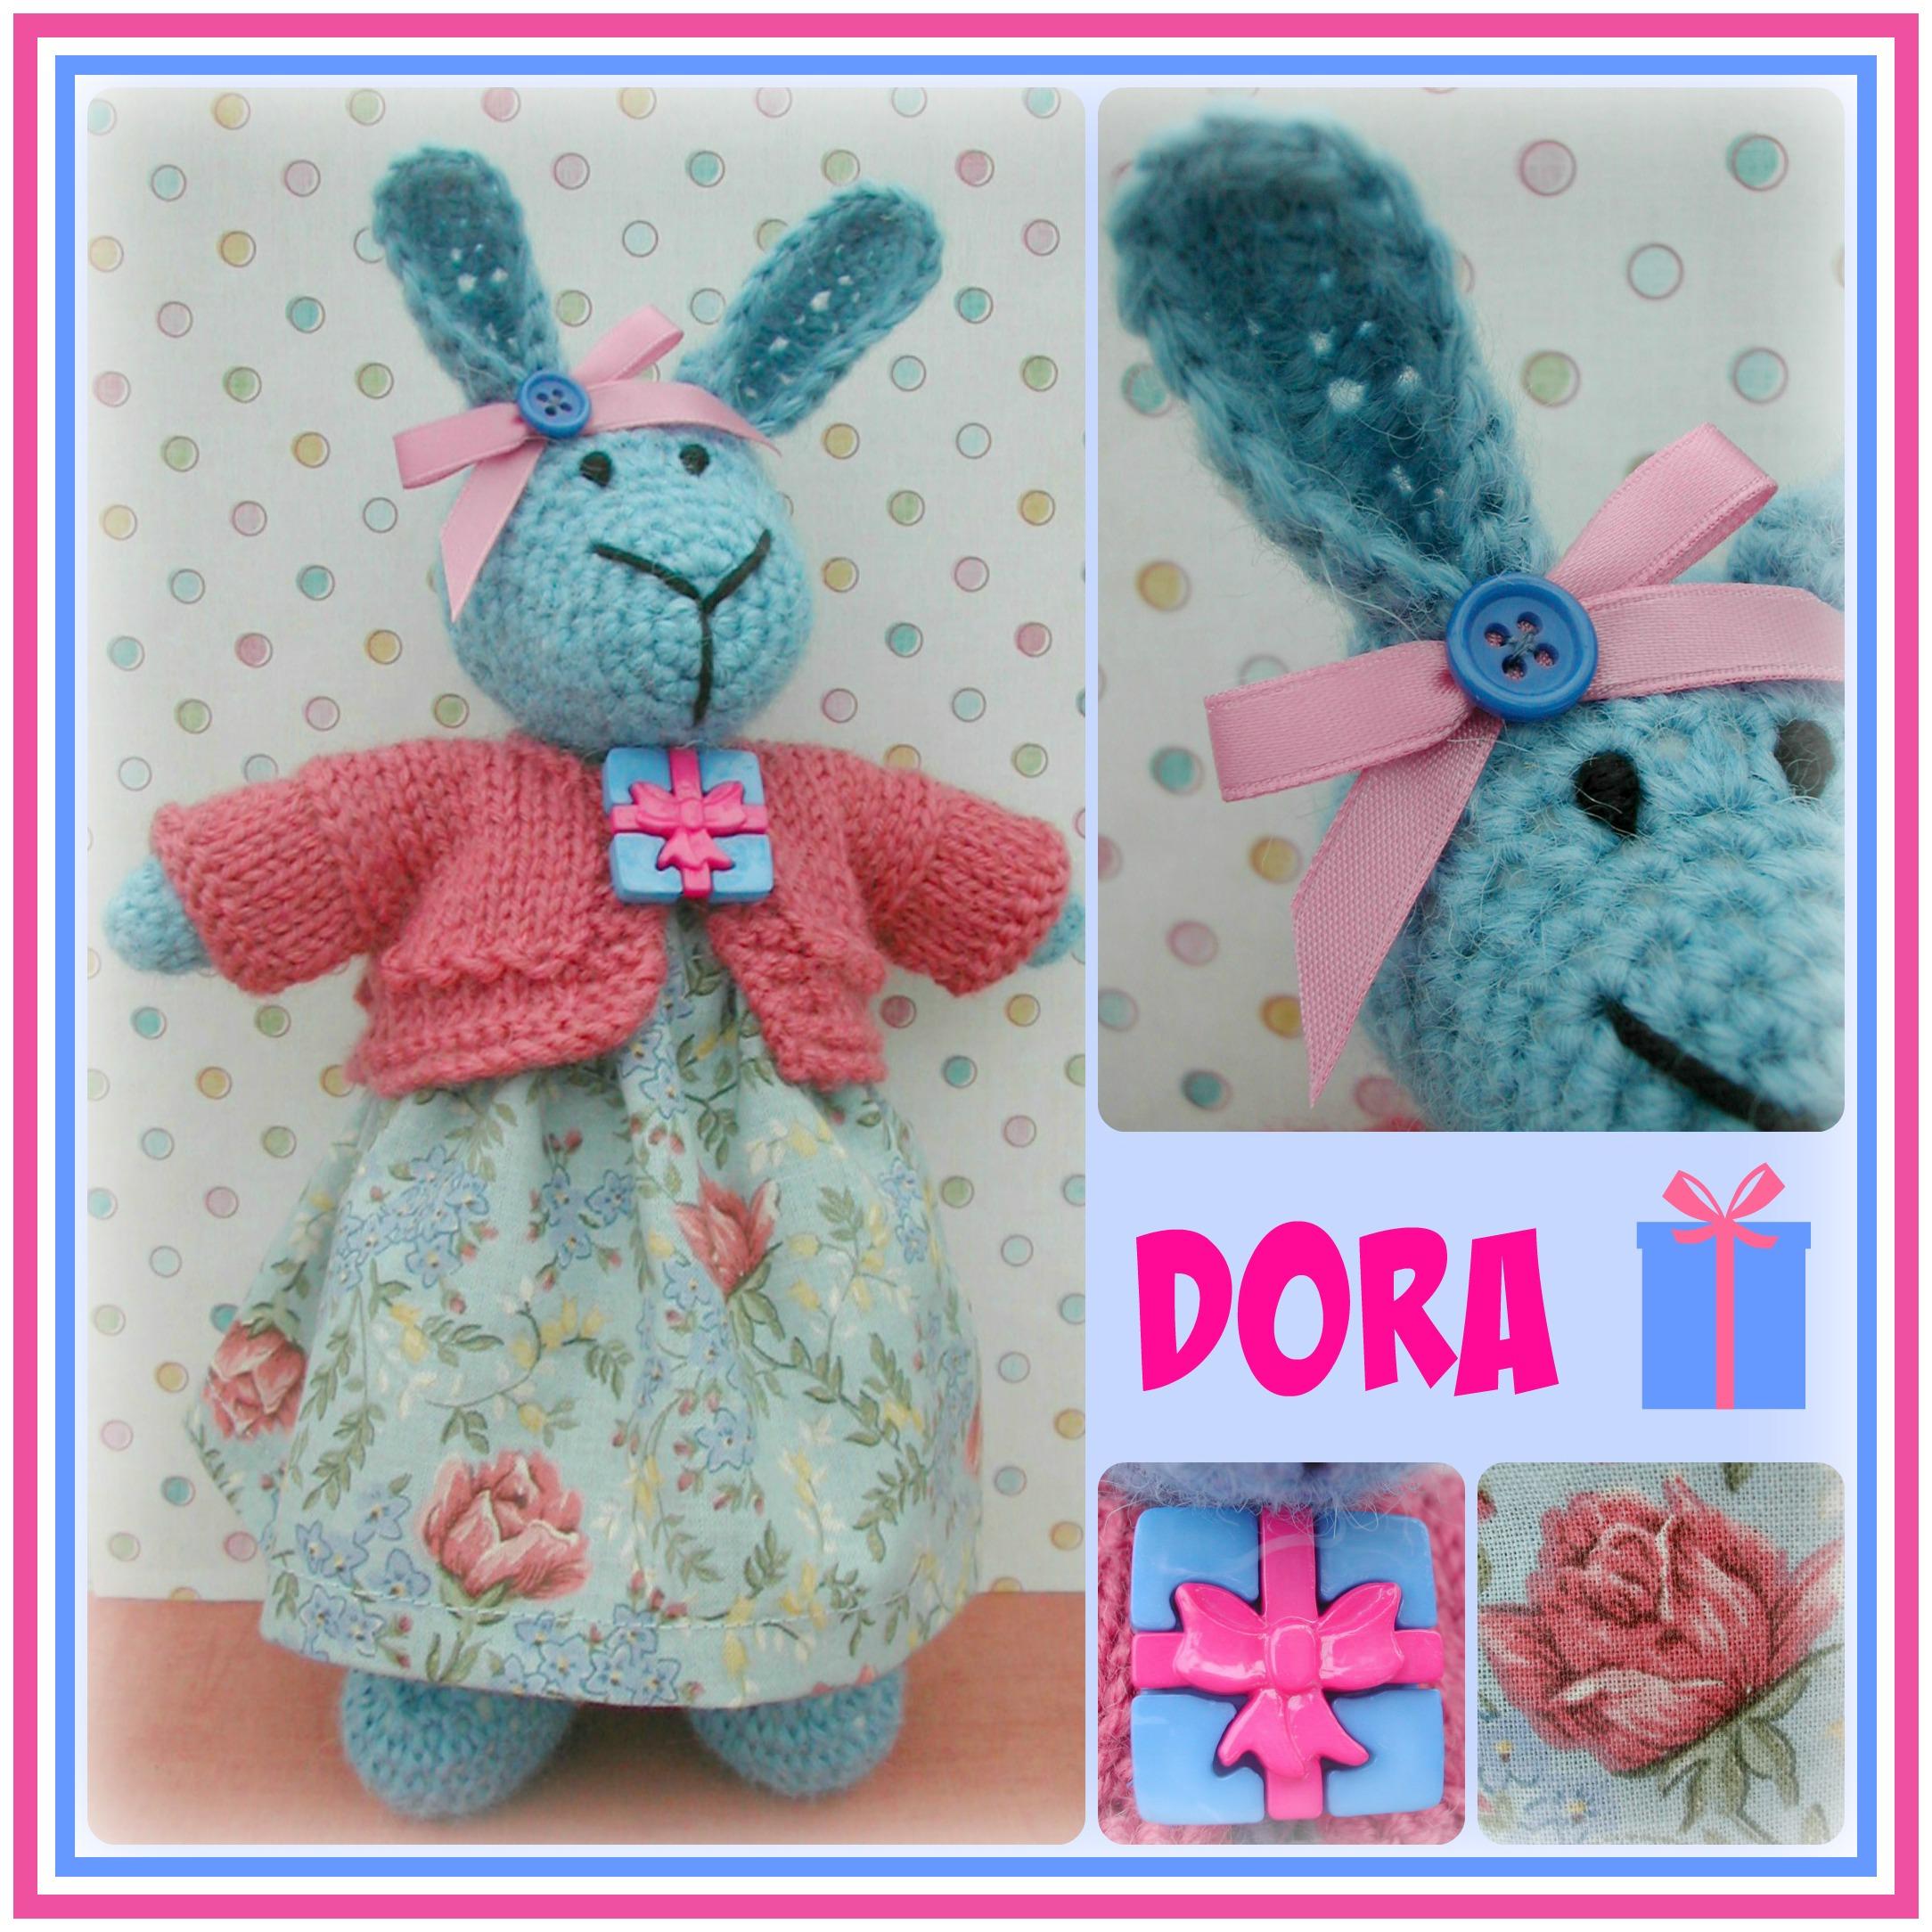 Dora Collage